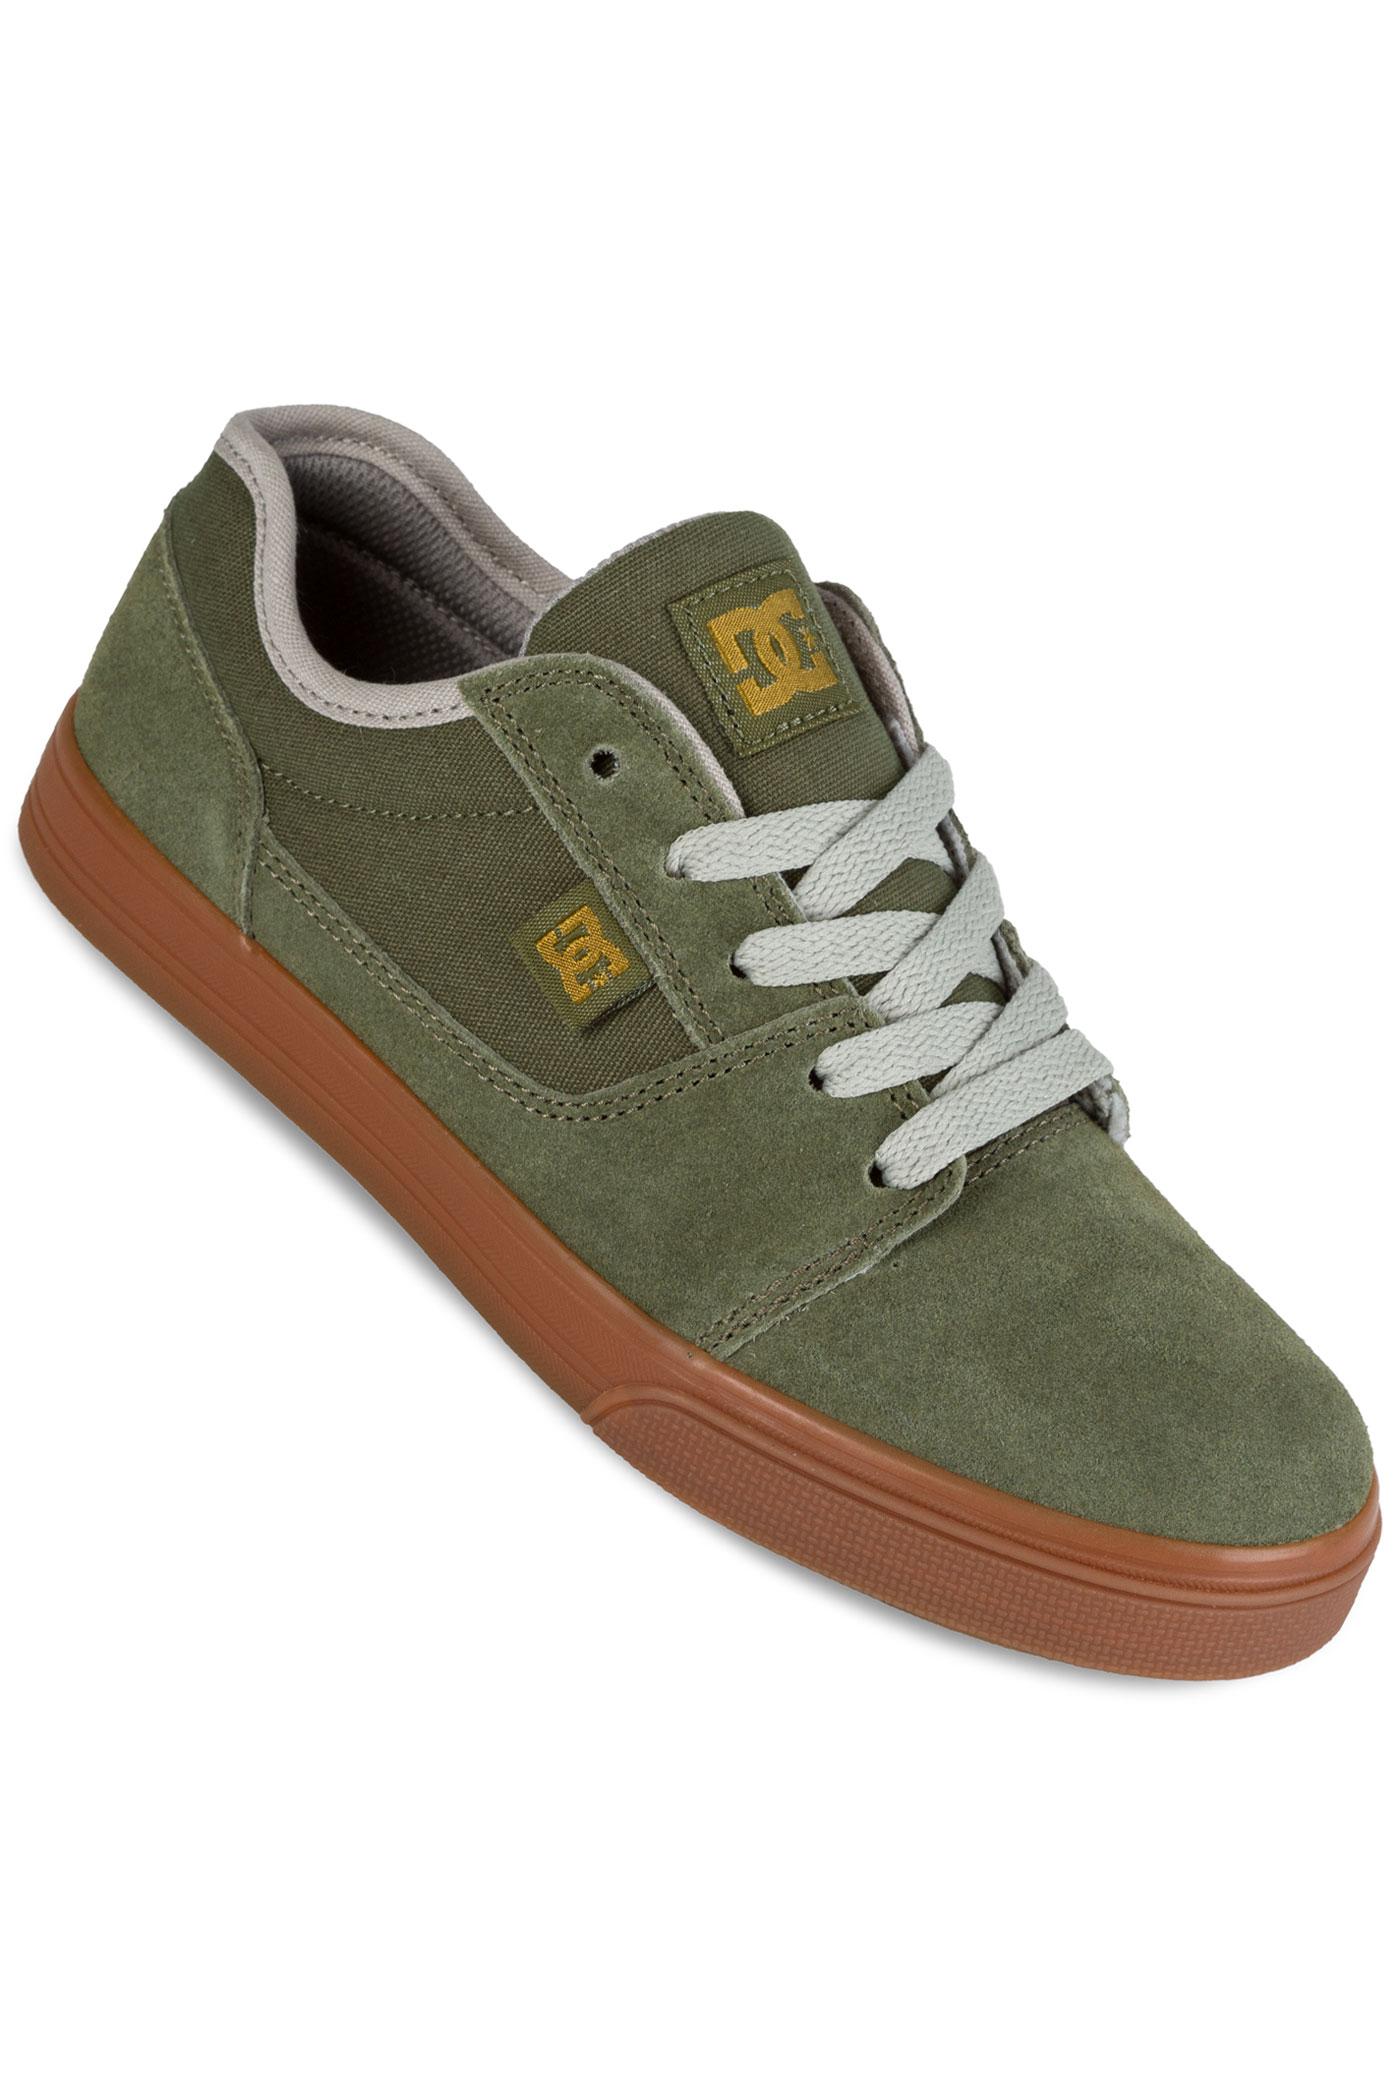 Conversion Taille Dc Shoes